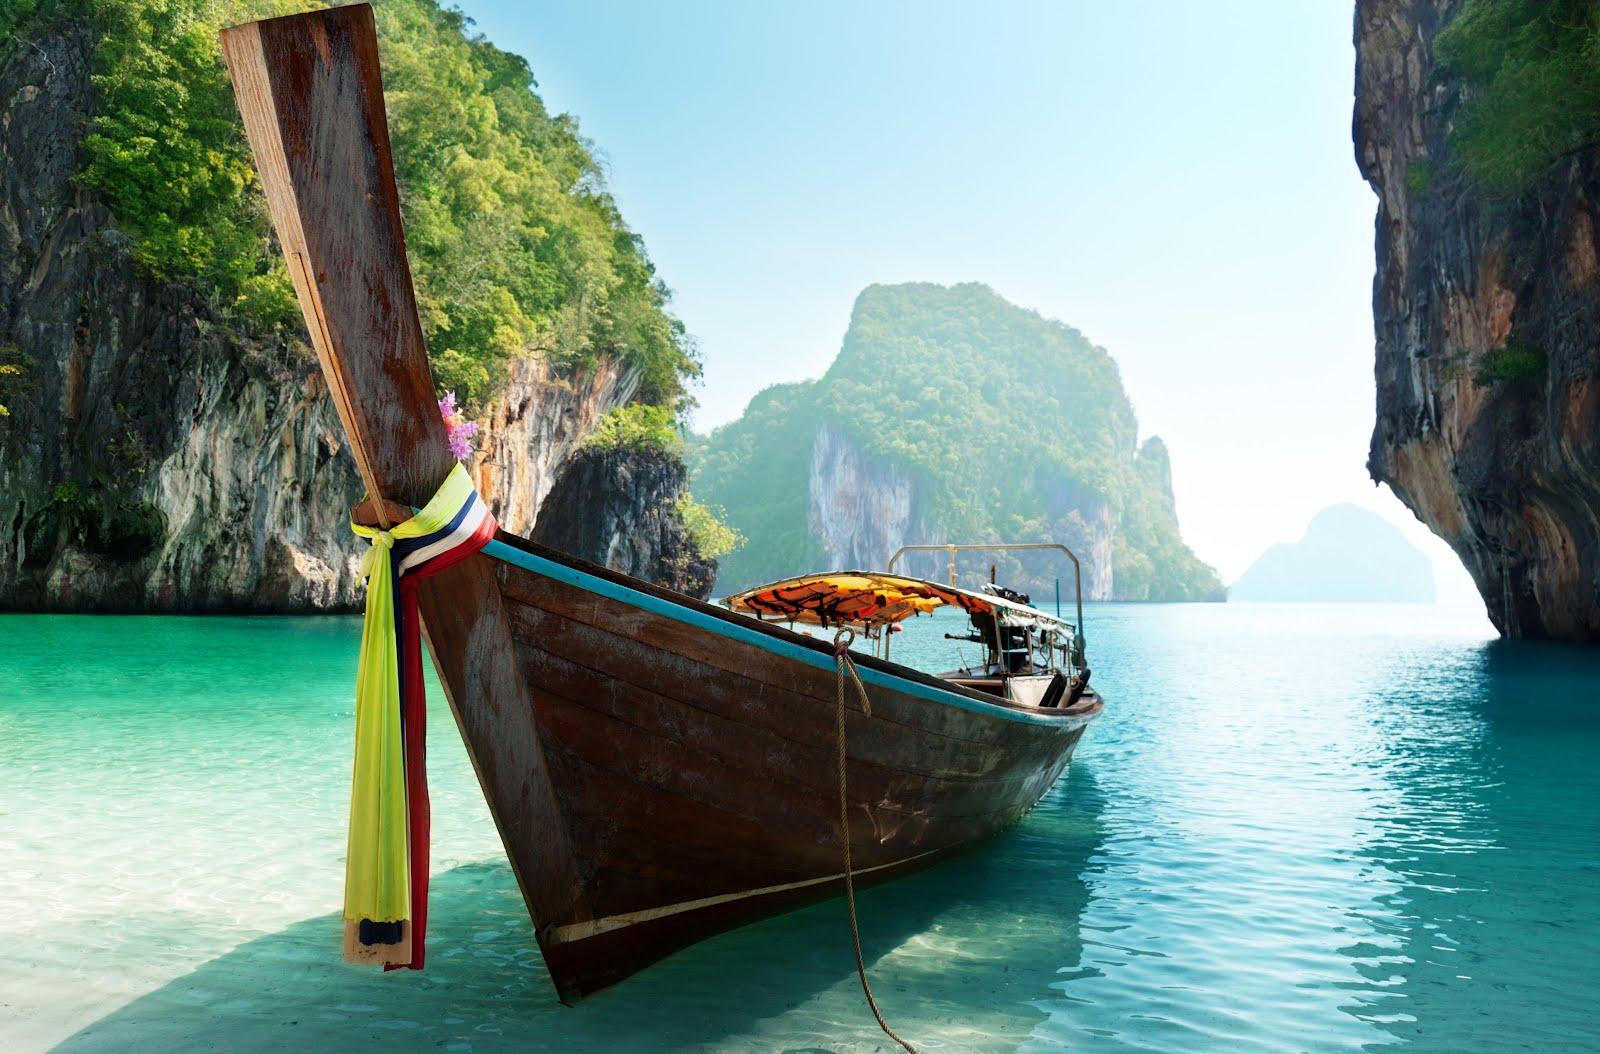 http://4.bp.blogspot.com/-t6geZuCqeMA/T8kQ6BzIQsI/AAAAAAAA6JE/YsfZnis9UeU/s1600/barco-en-las-islas-andaman-tailandia-boat-and-islands-in-andaman-sea-thailand.jpg